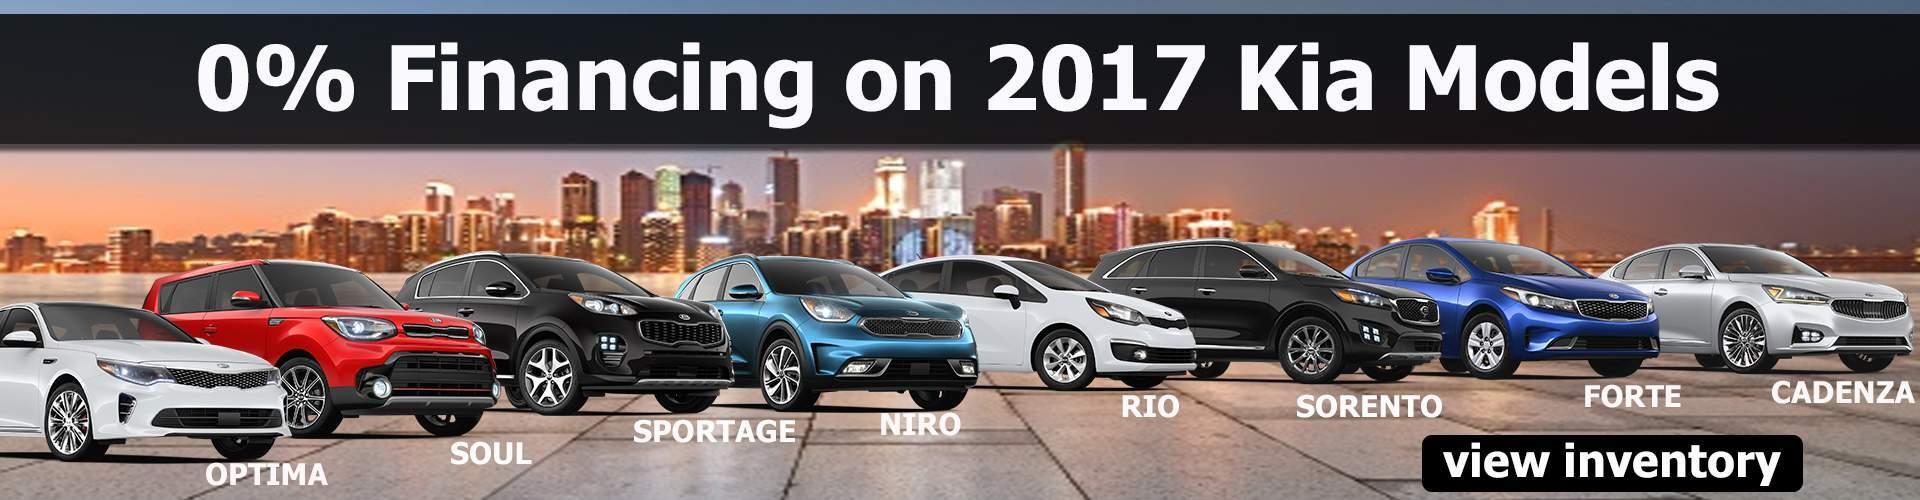 dealership leesburg fl used cars bill bryan kia 2017 models